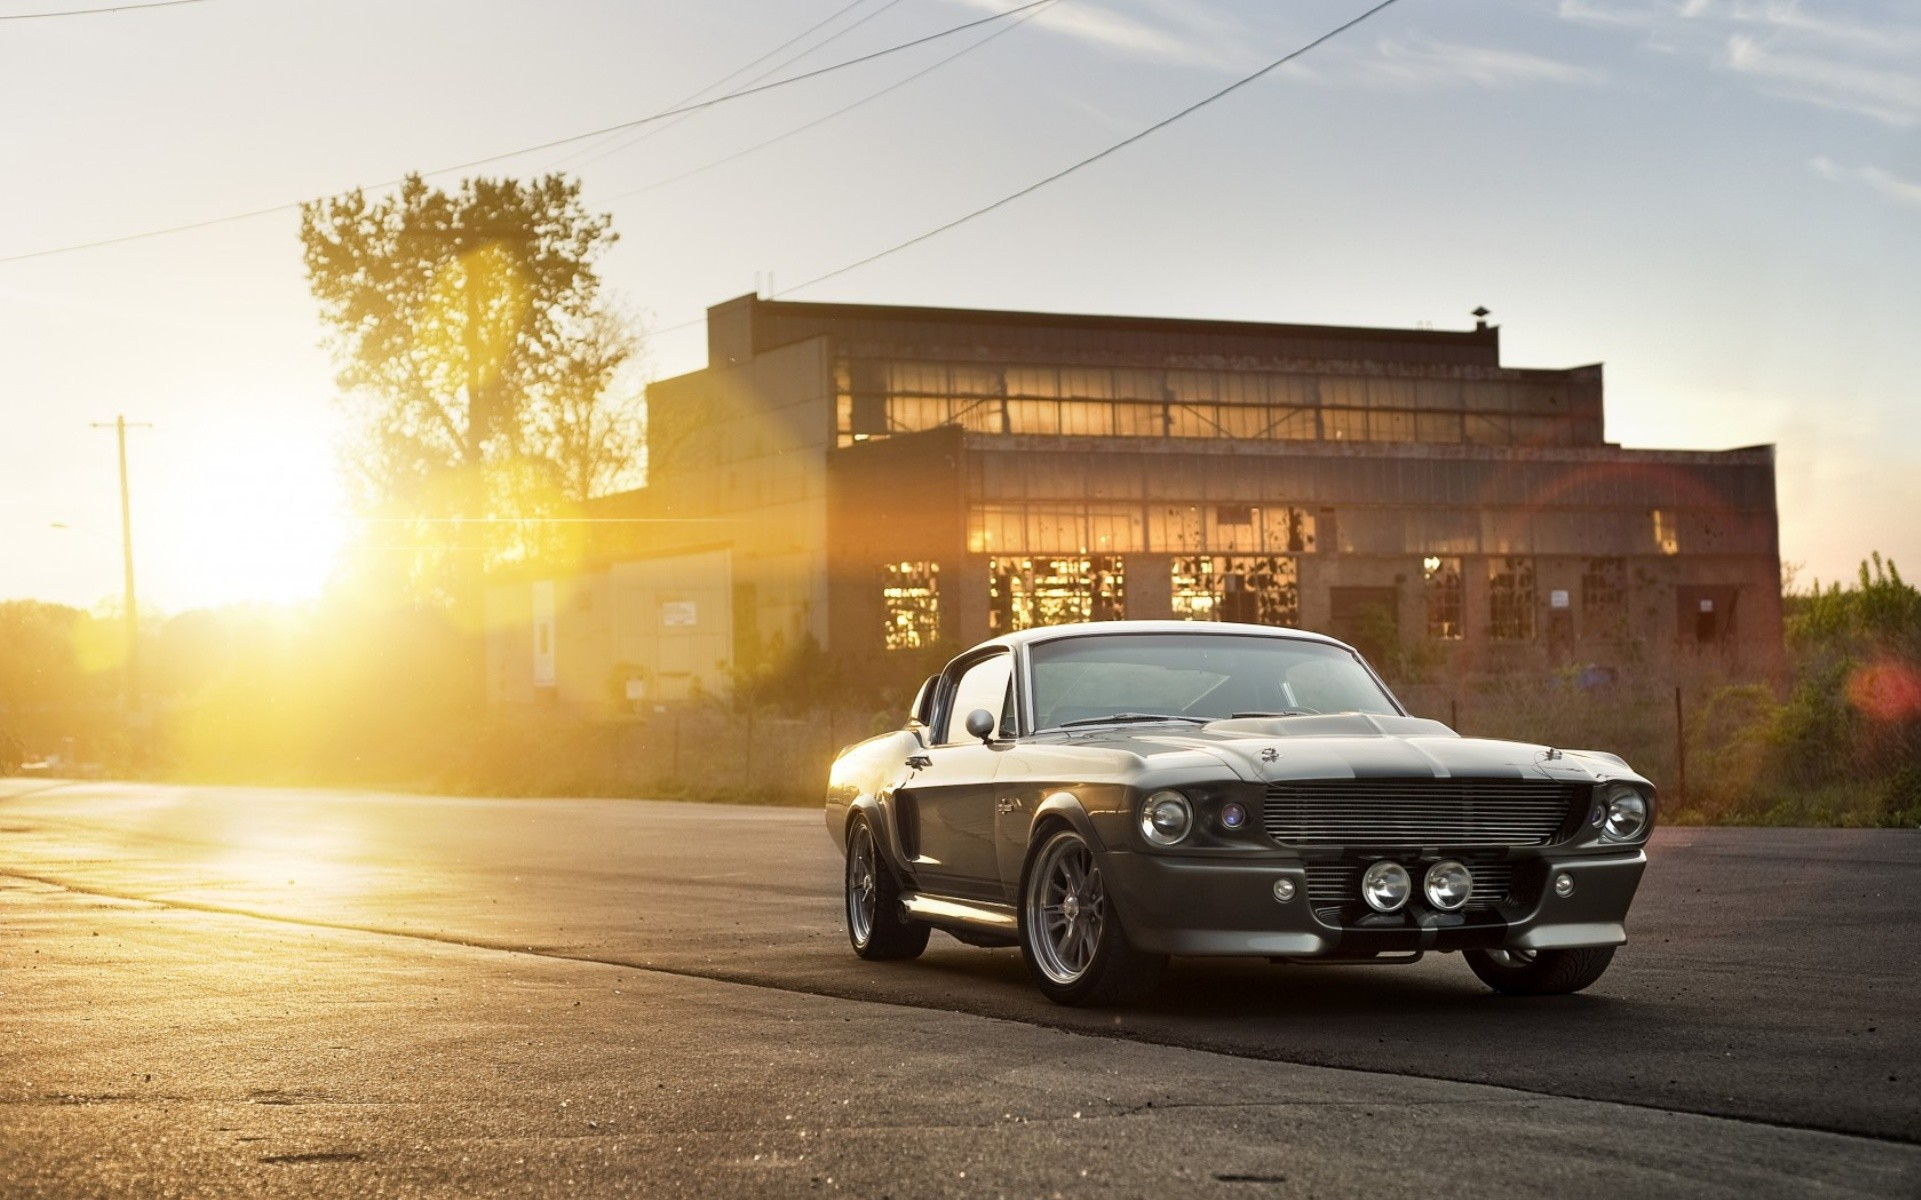 67 Mustang Wallpaper 50 Images